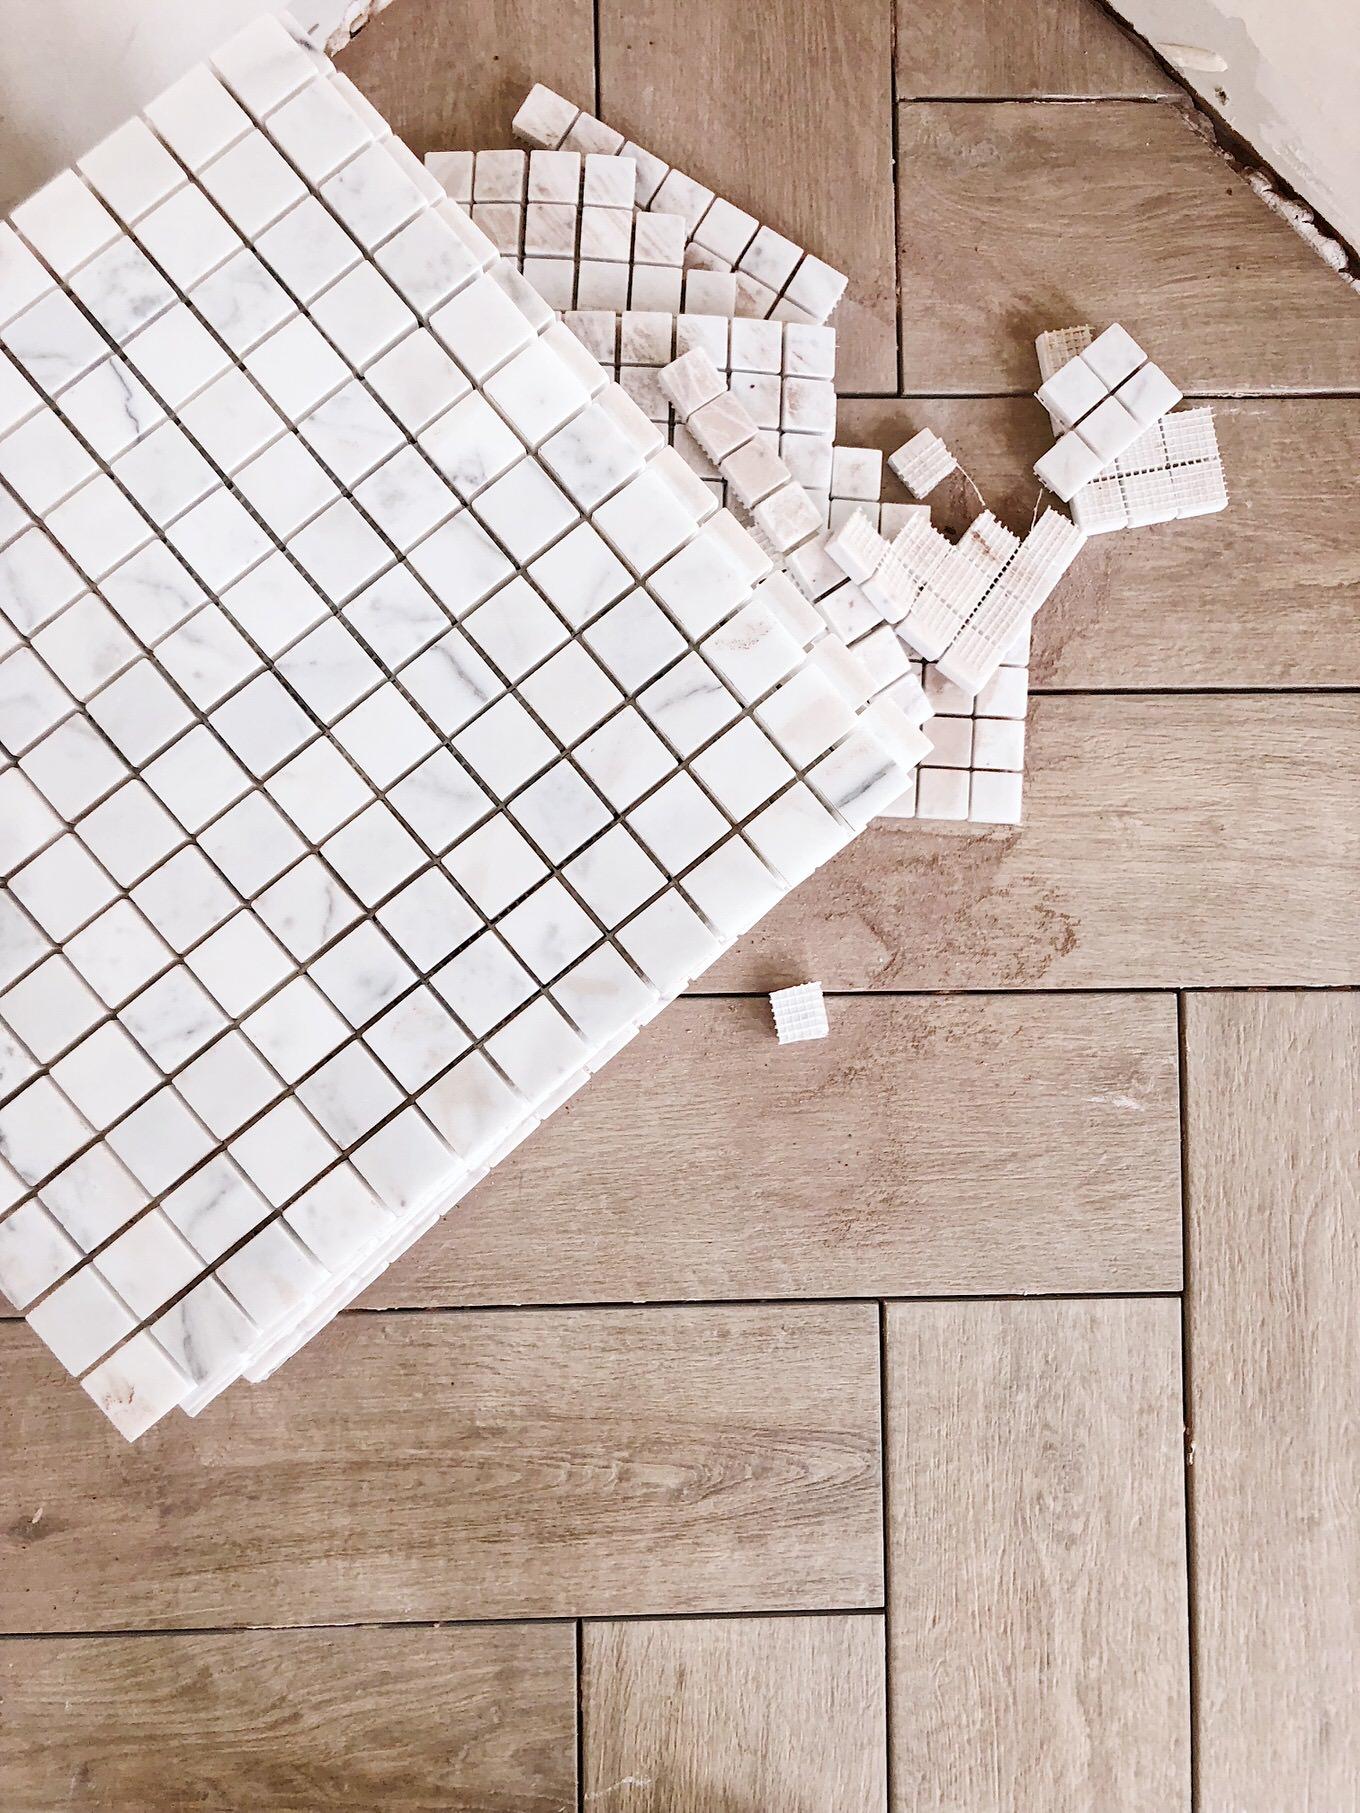 flooring details